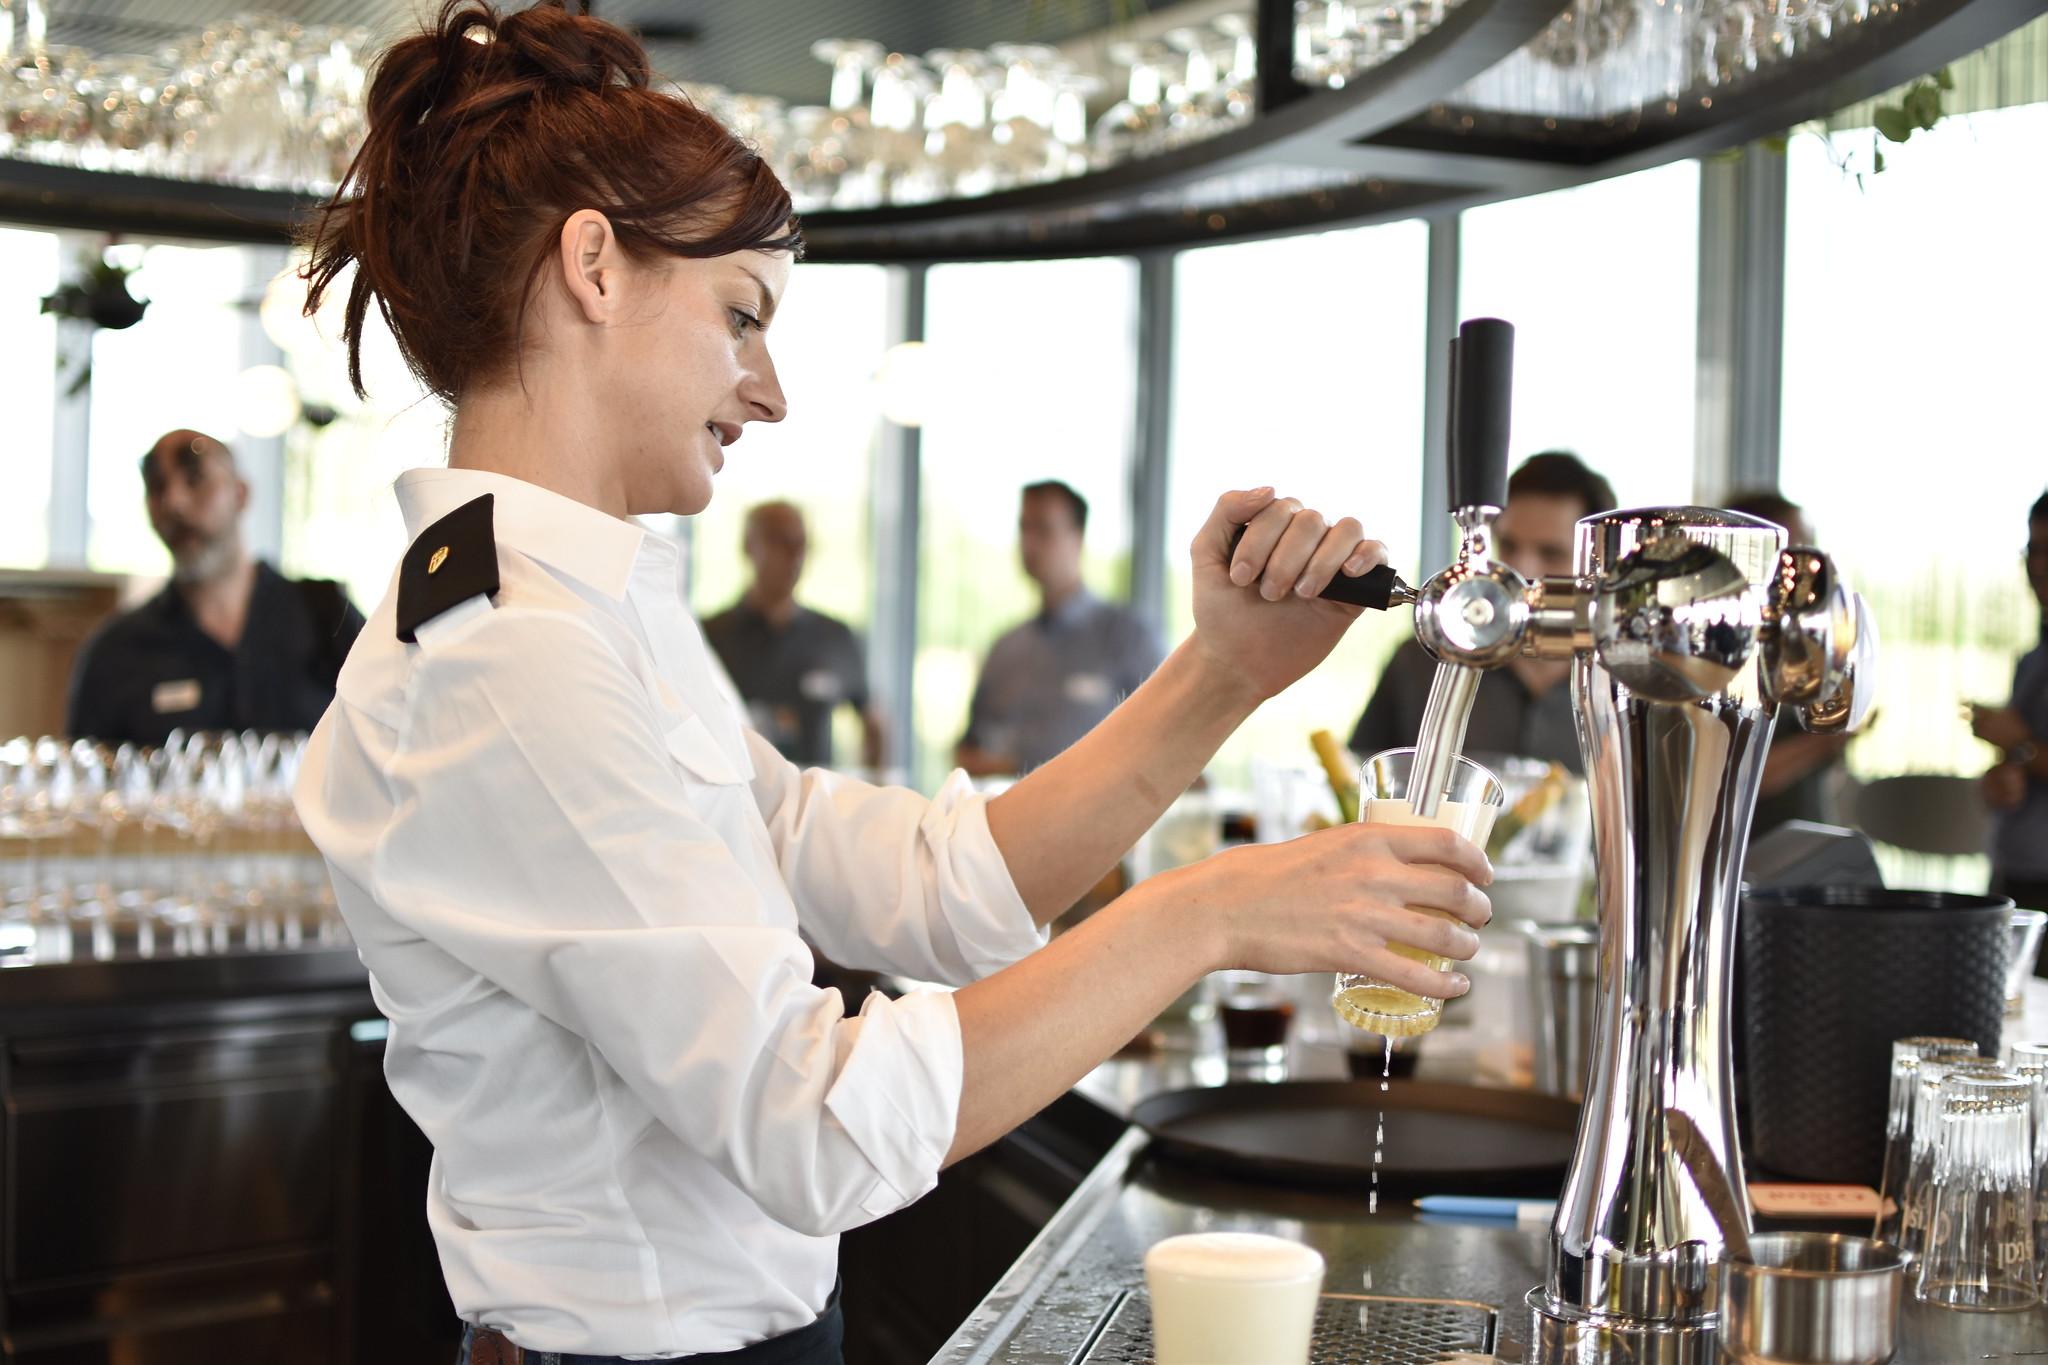 20190625 - Droneport Café